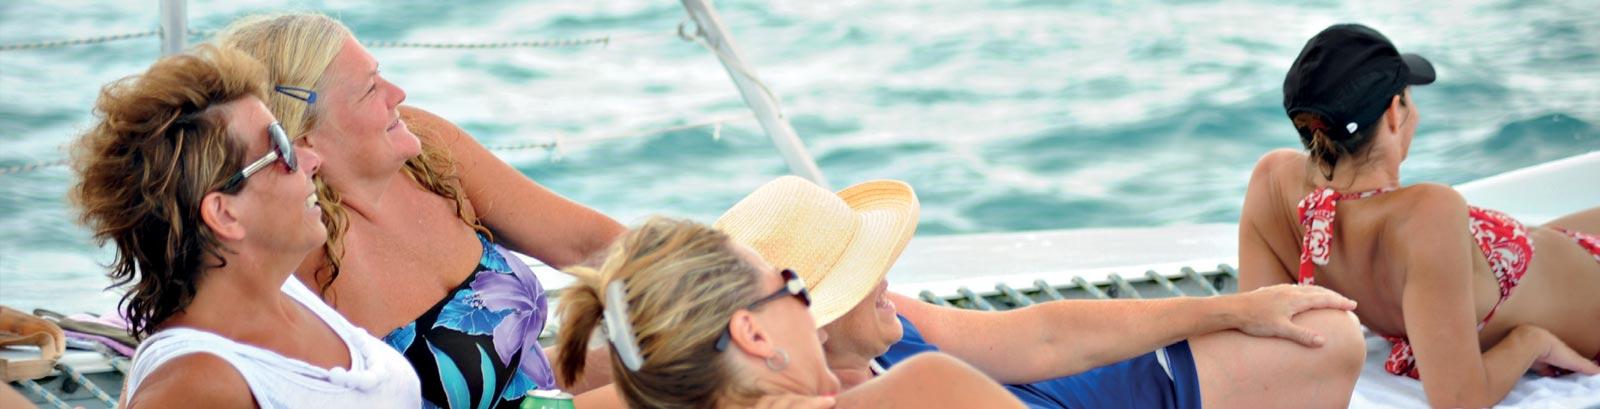 A Week of Fun in St. Maarten, Simpson Bay Resort, Marina & Spa